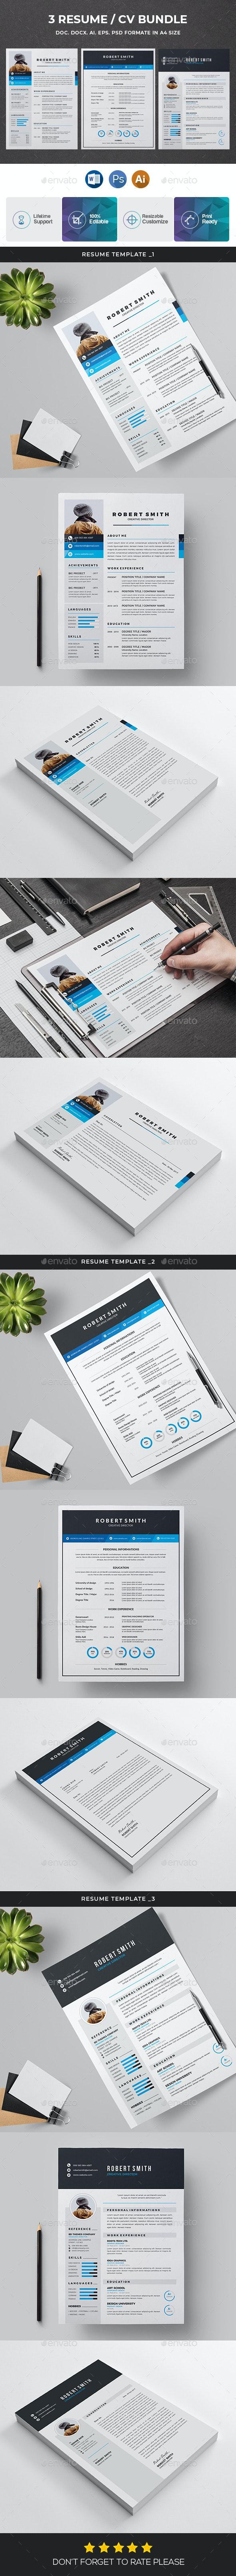 Resume Bundle 3 in 1 - Resumes Stationery